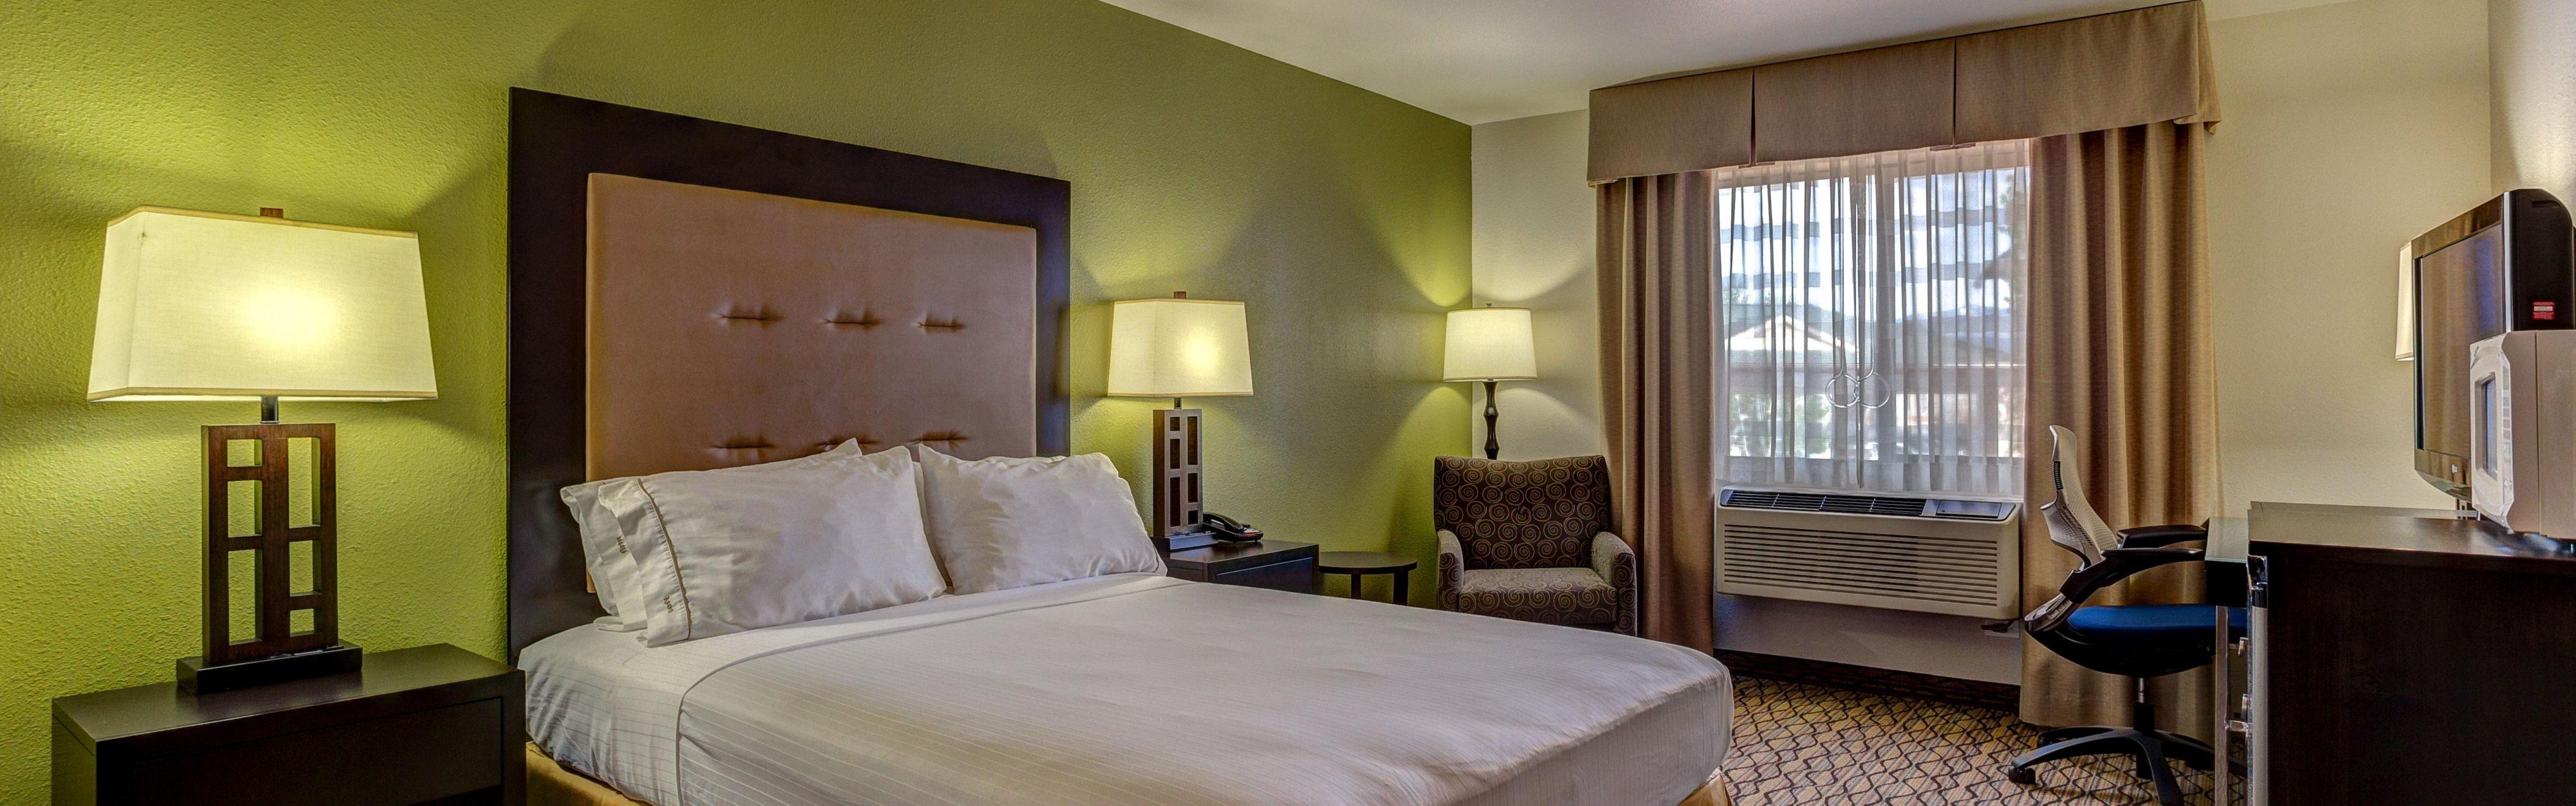 Holiday Inn Express & Suites Montrose image 1